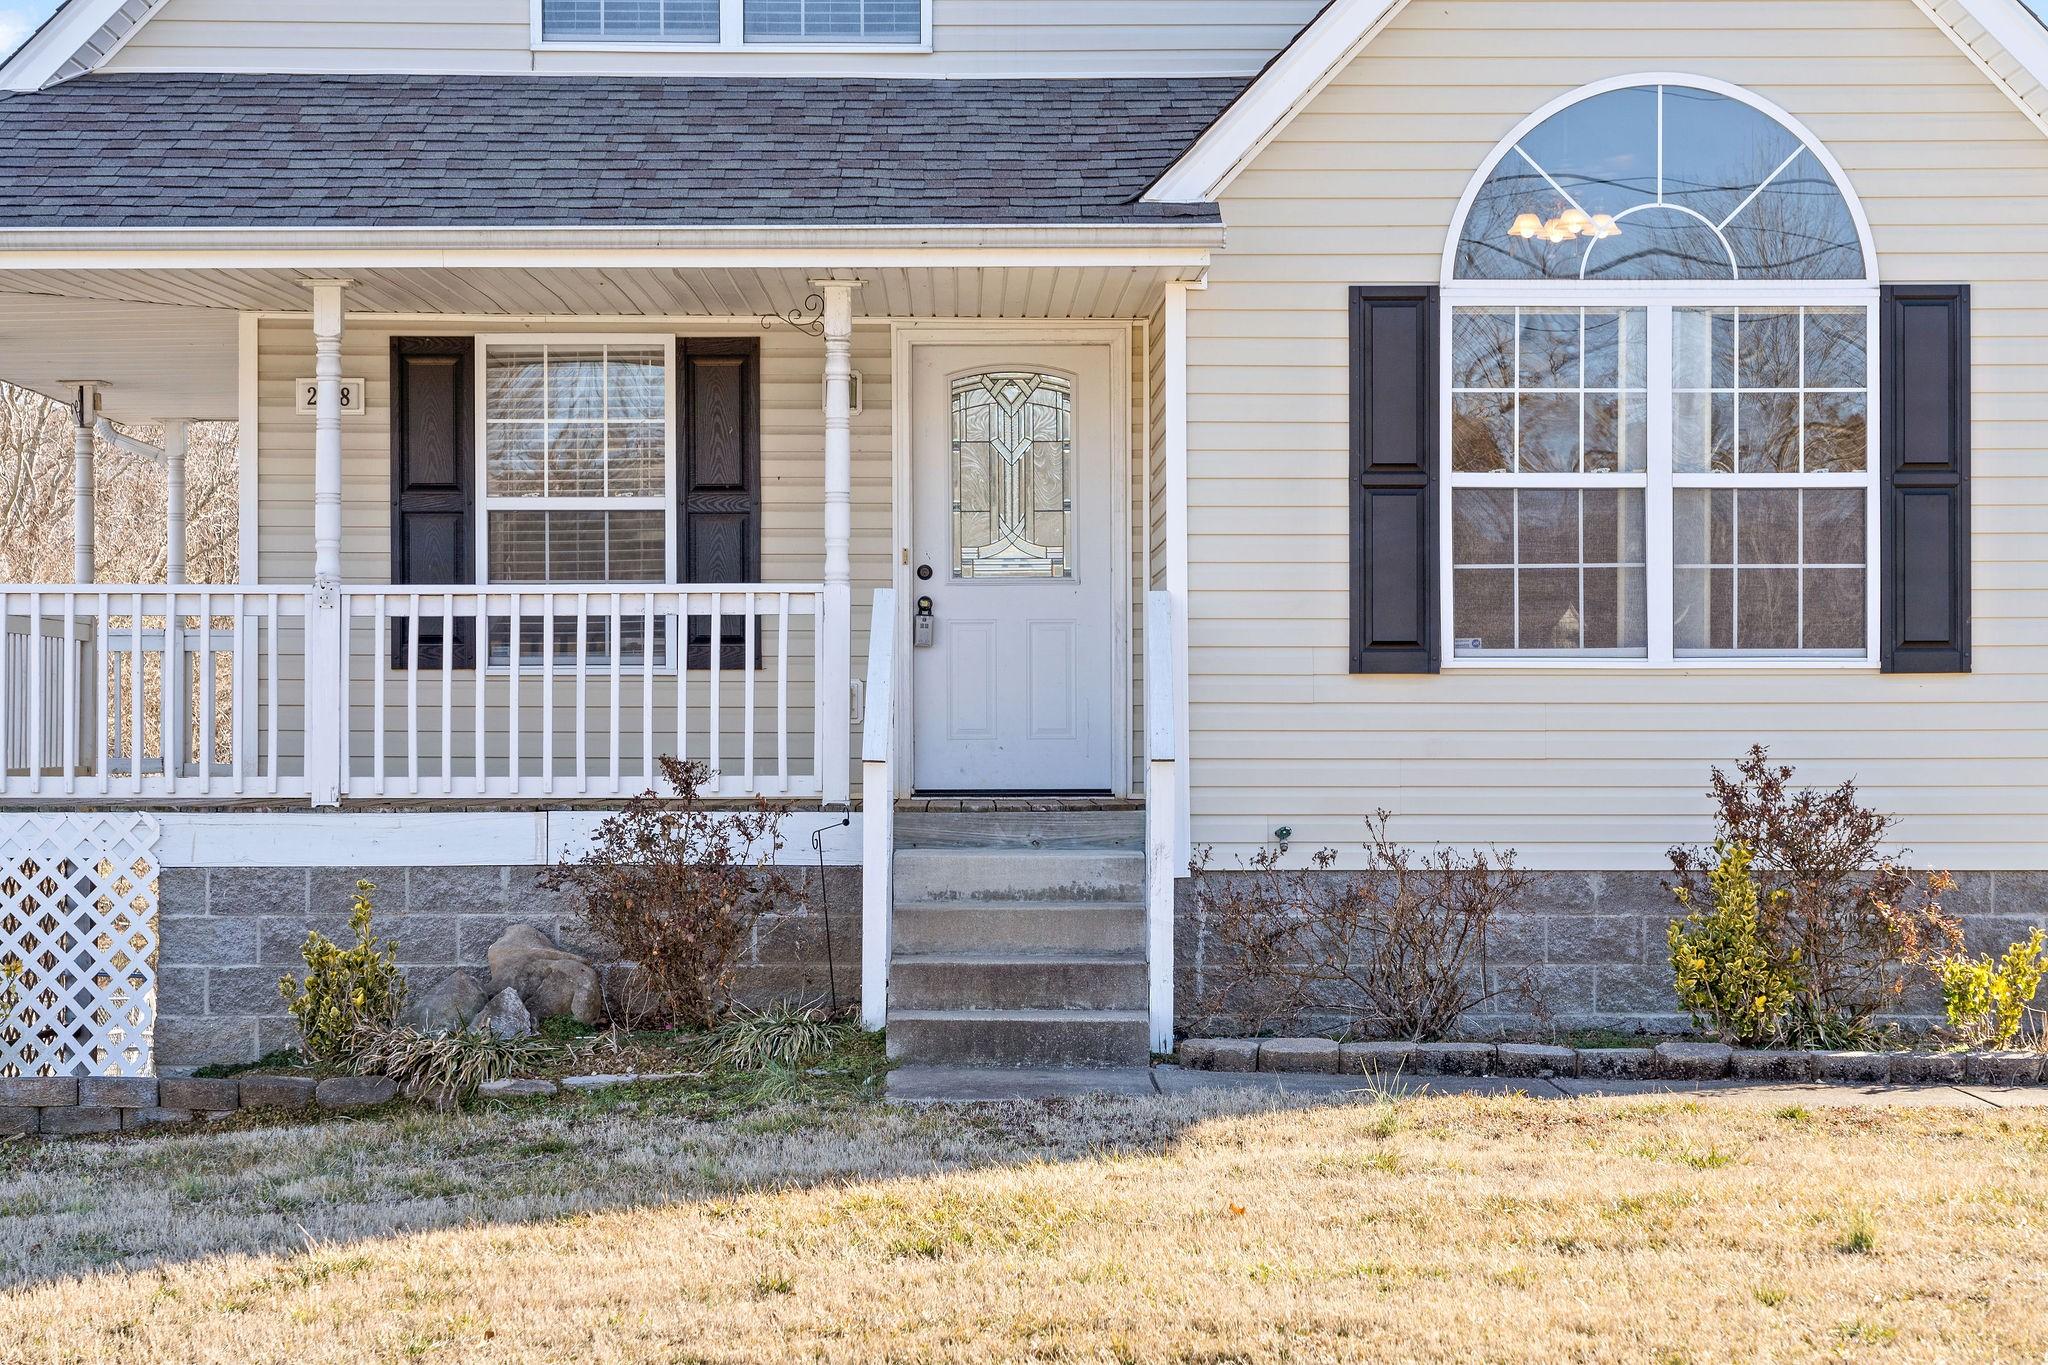 2758 Cider Dr Property Photo - Clarksville, TN real estate listing